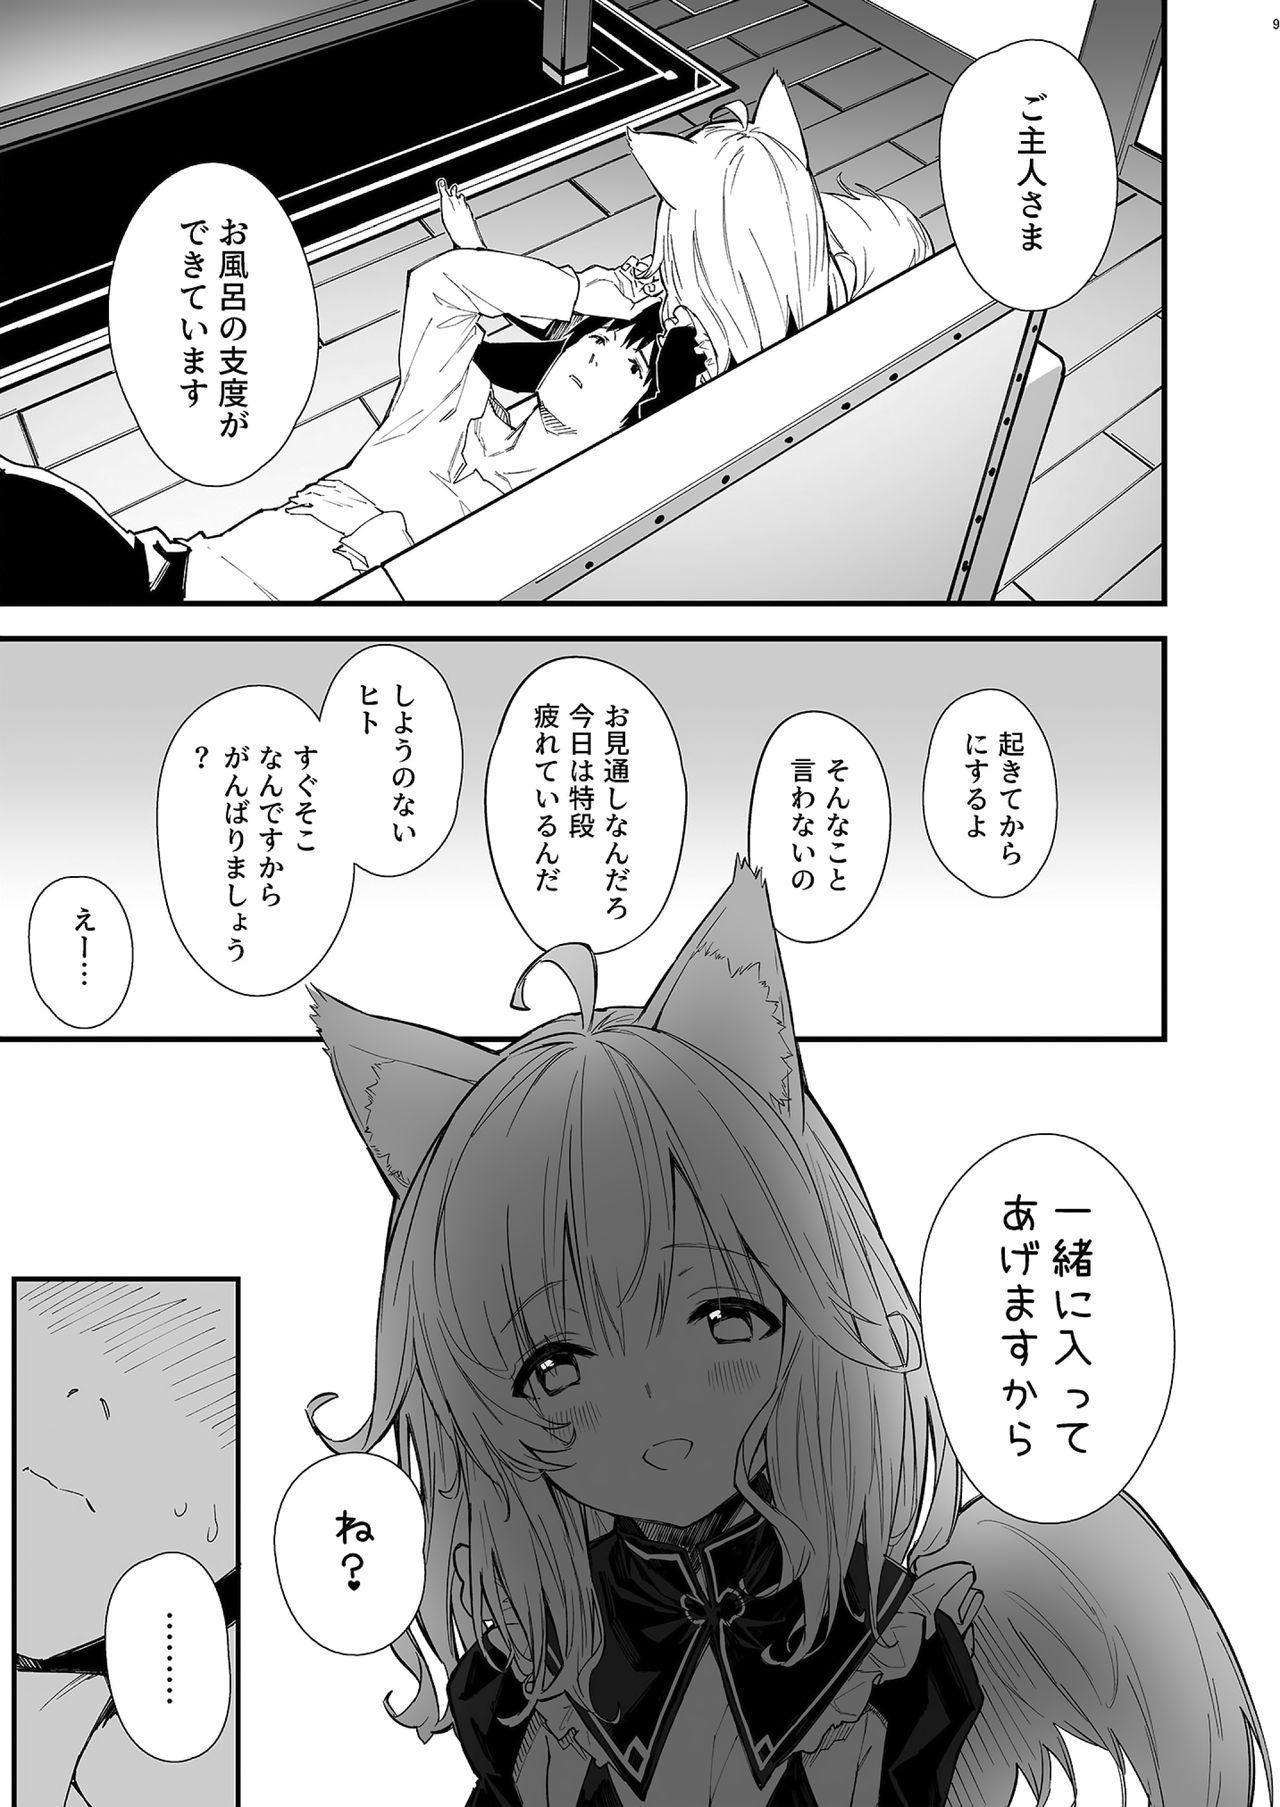 Kemomimi Maid to Ichaicha suru Hon 6